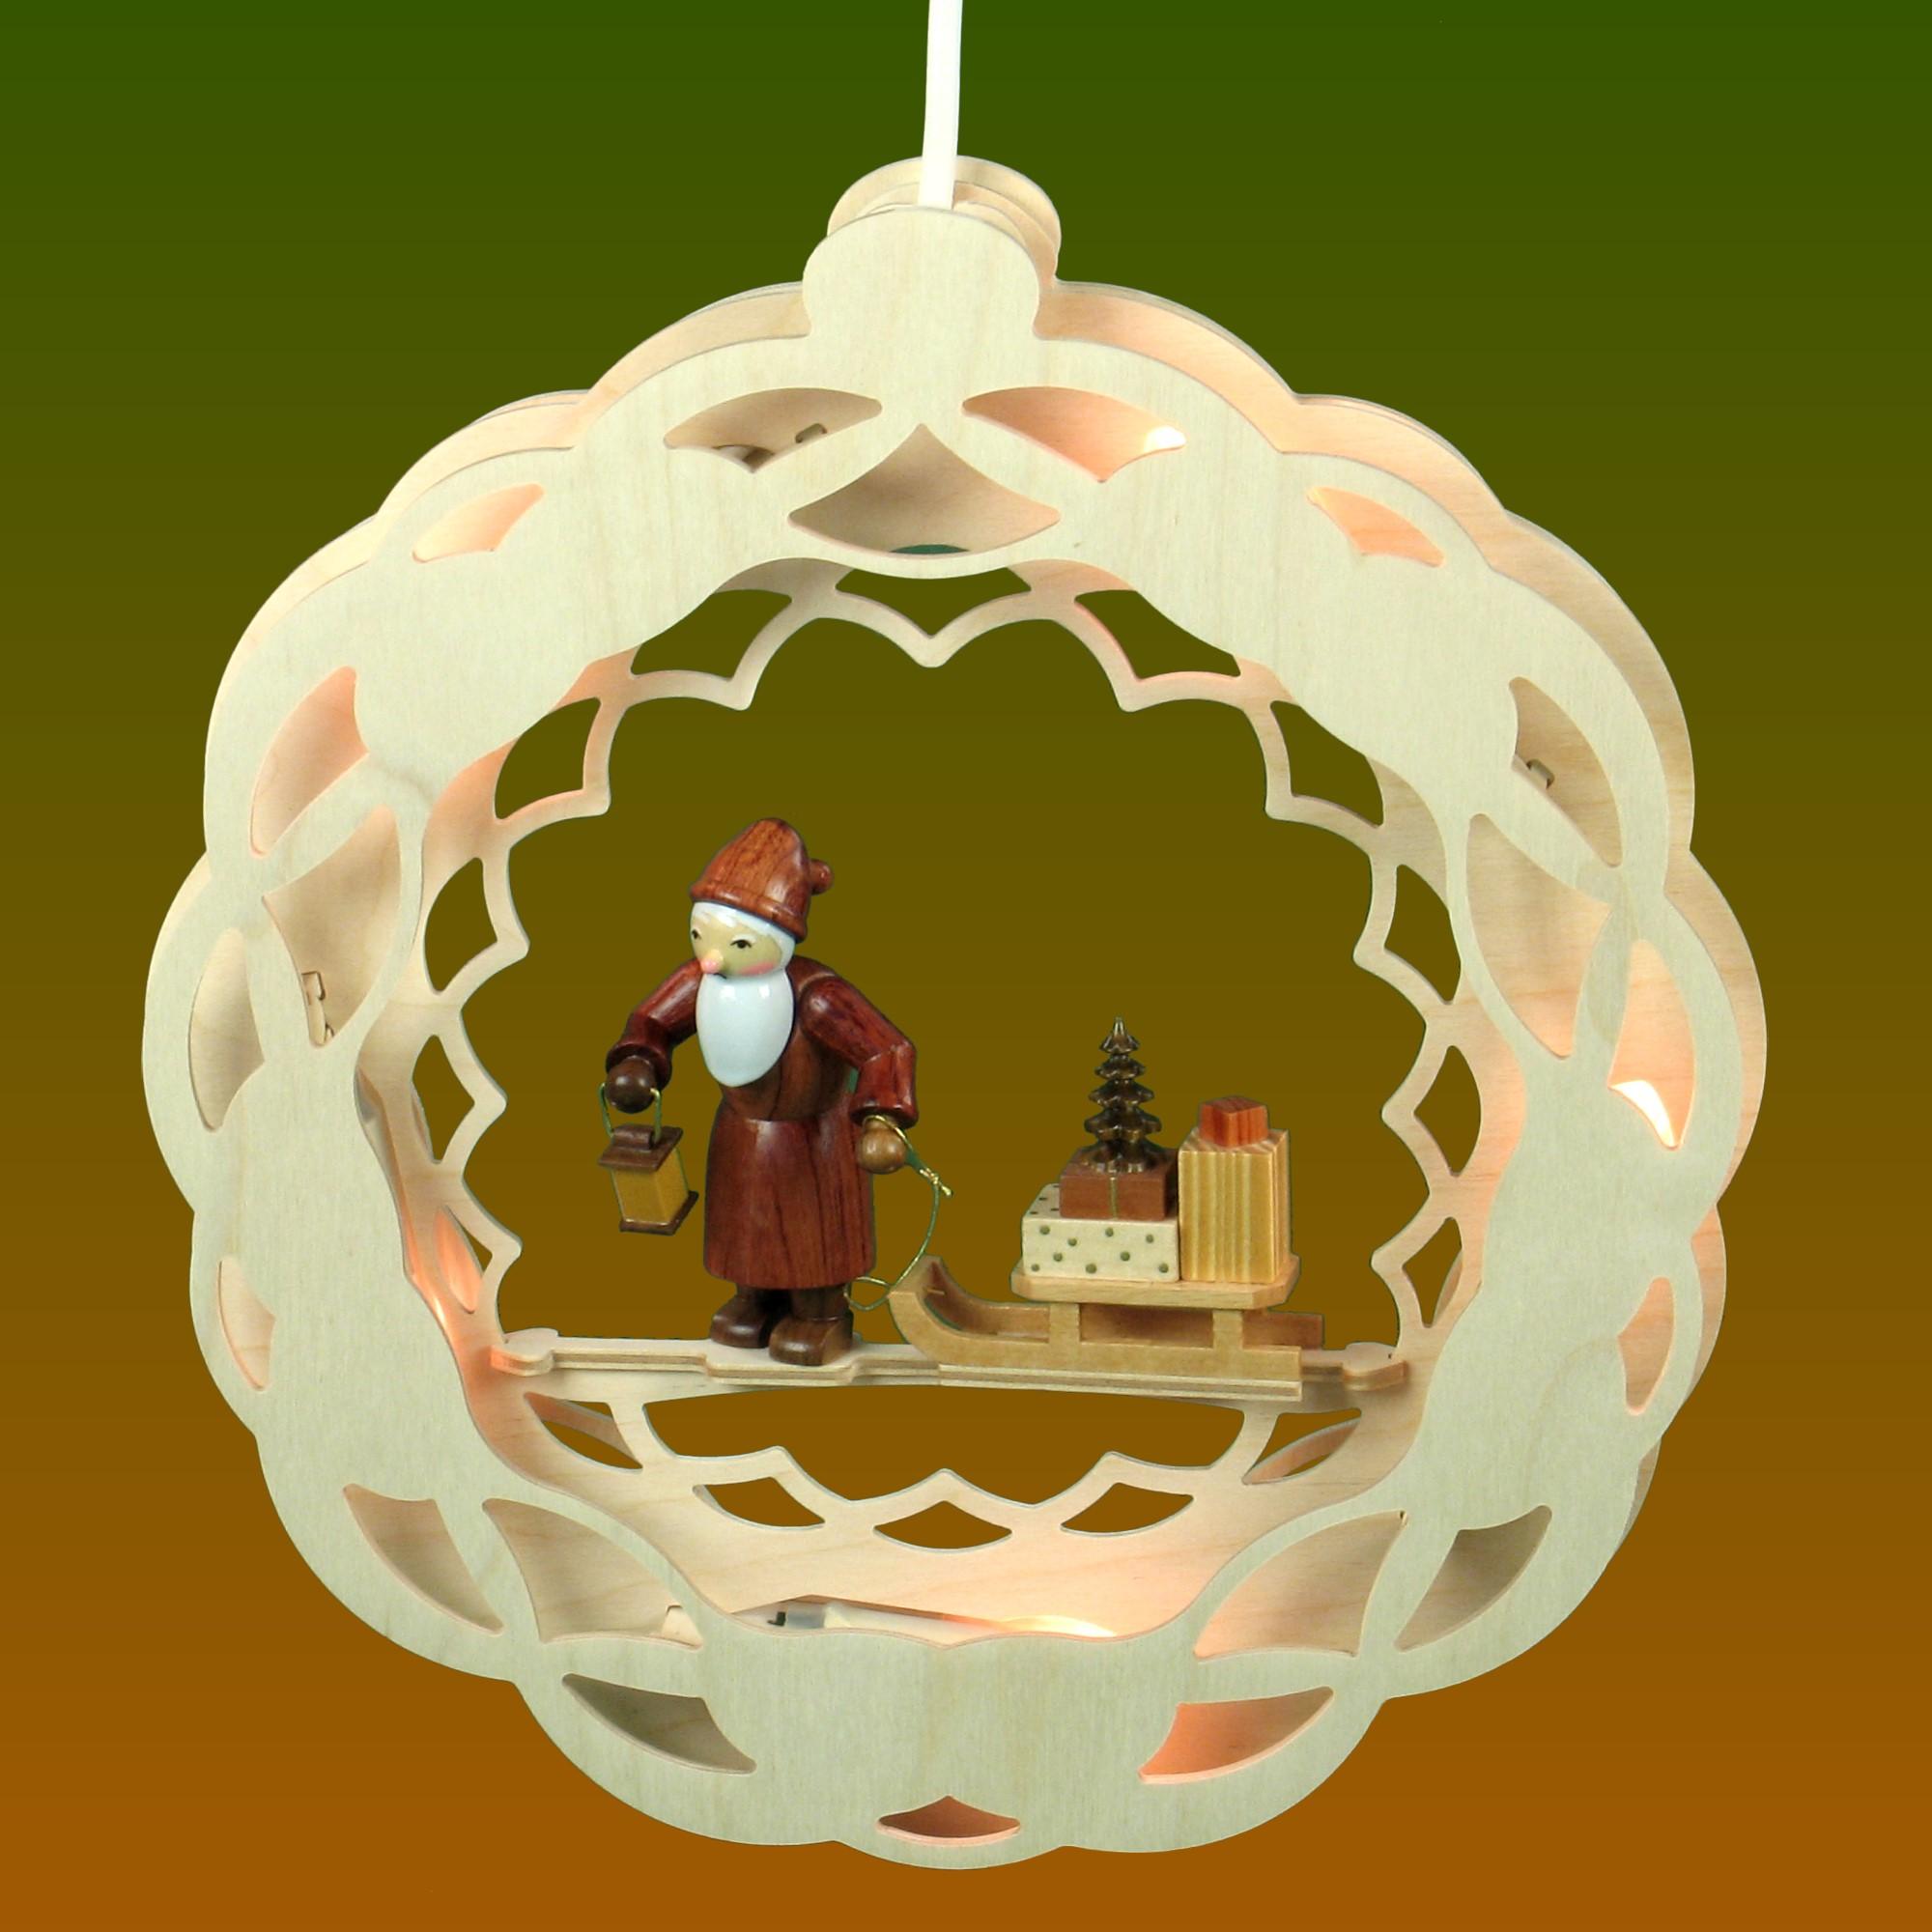 weihnachten erzgebirgische volkskunst schnitzer h usl. Black Bedroom Furniture Sets. Home Design Ideas